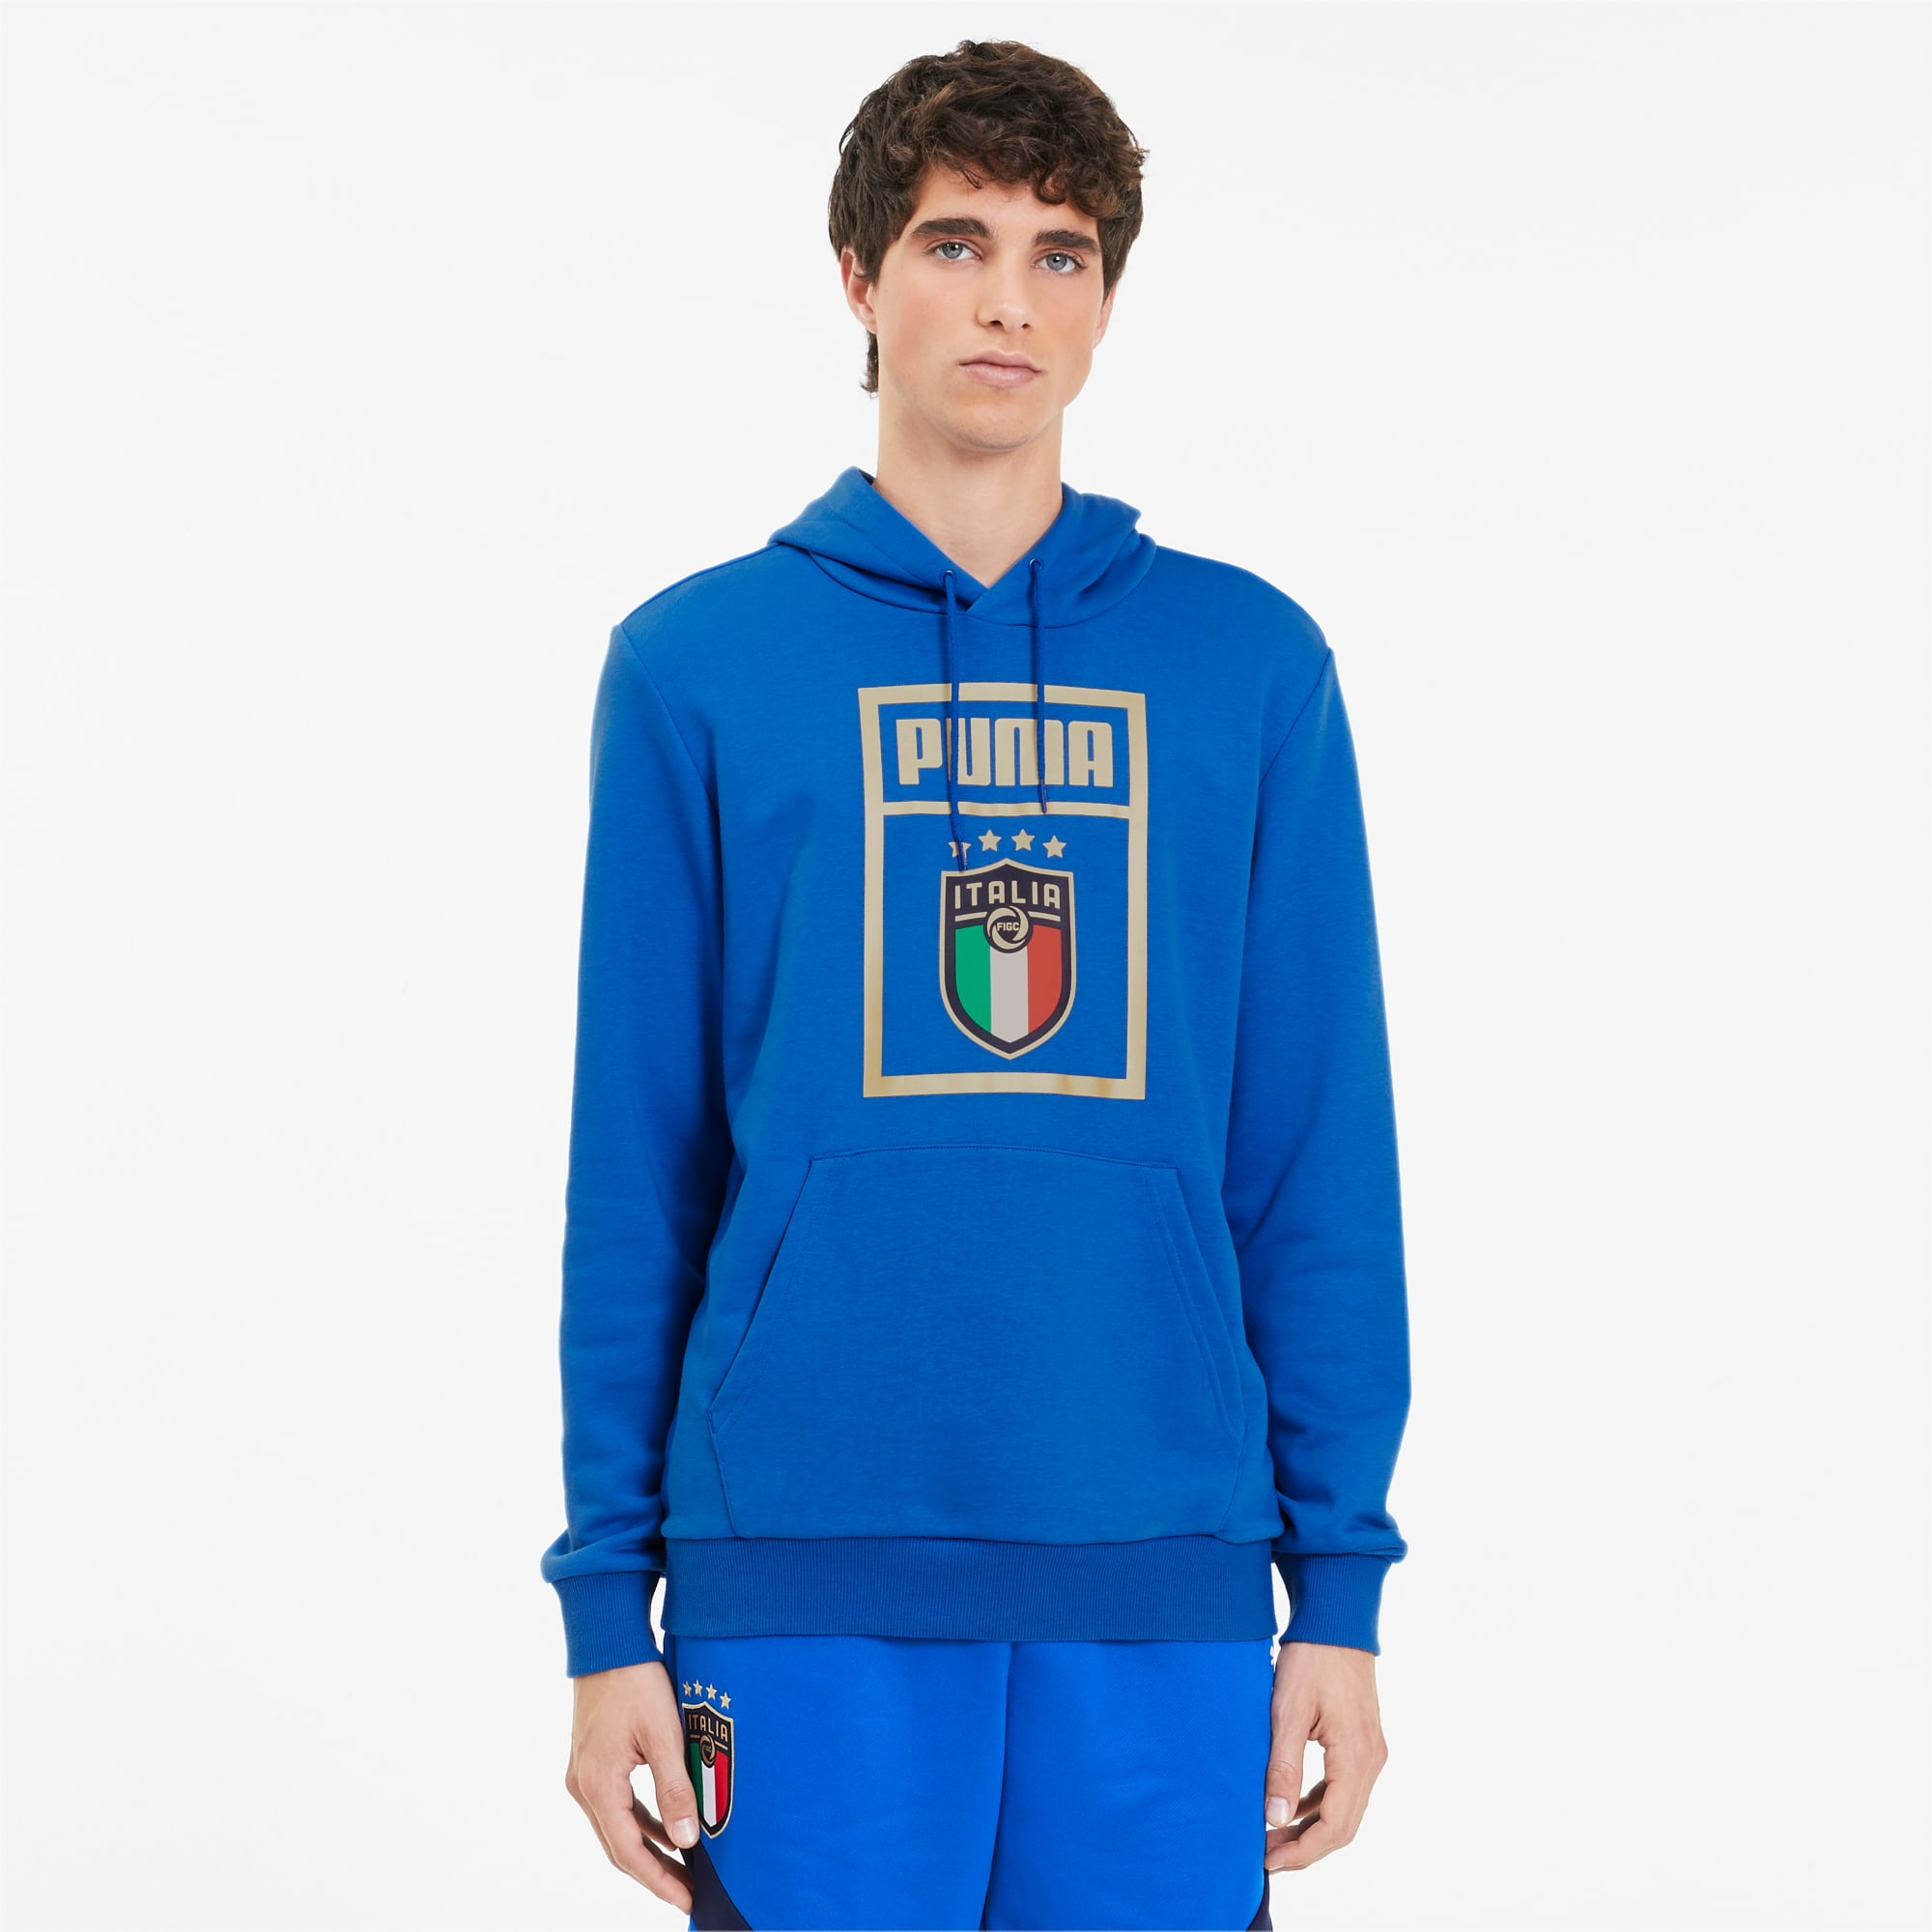 FIGC PUMA DNA Men's Hoodie